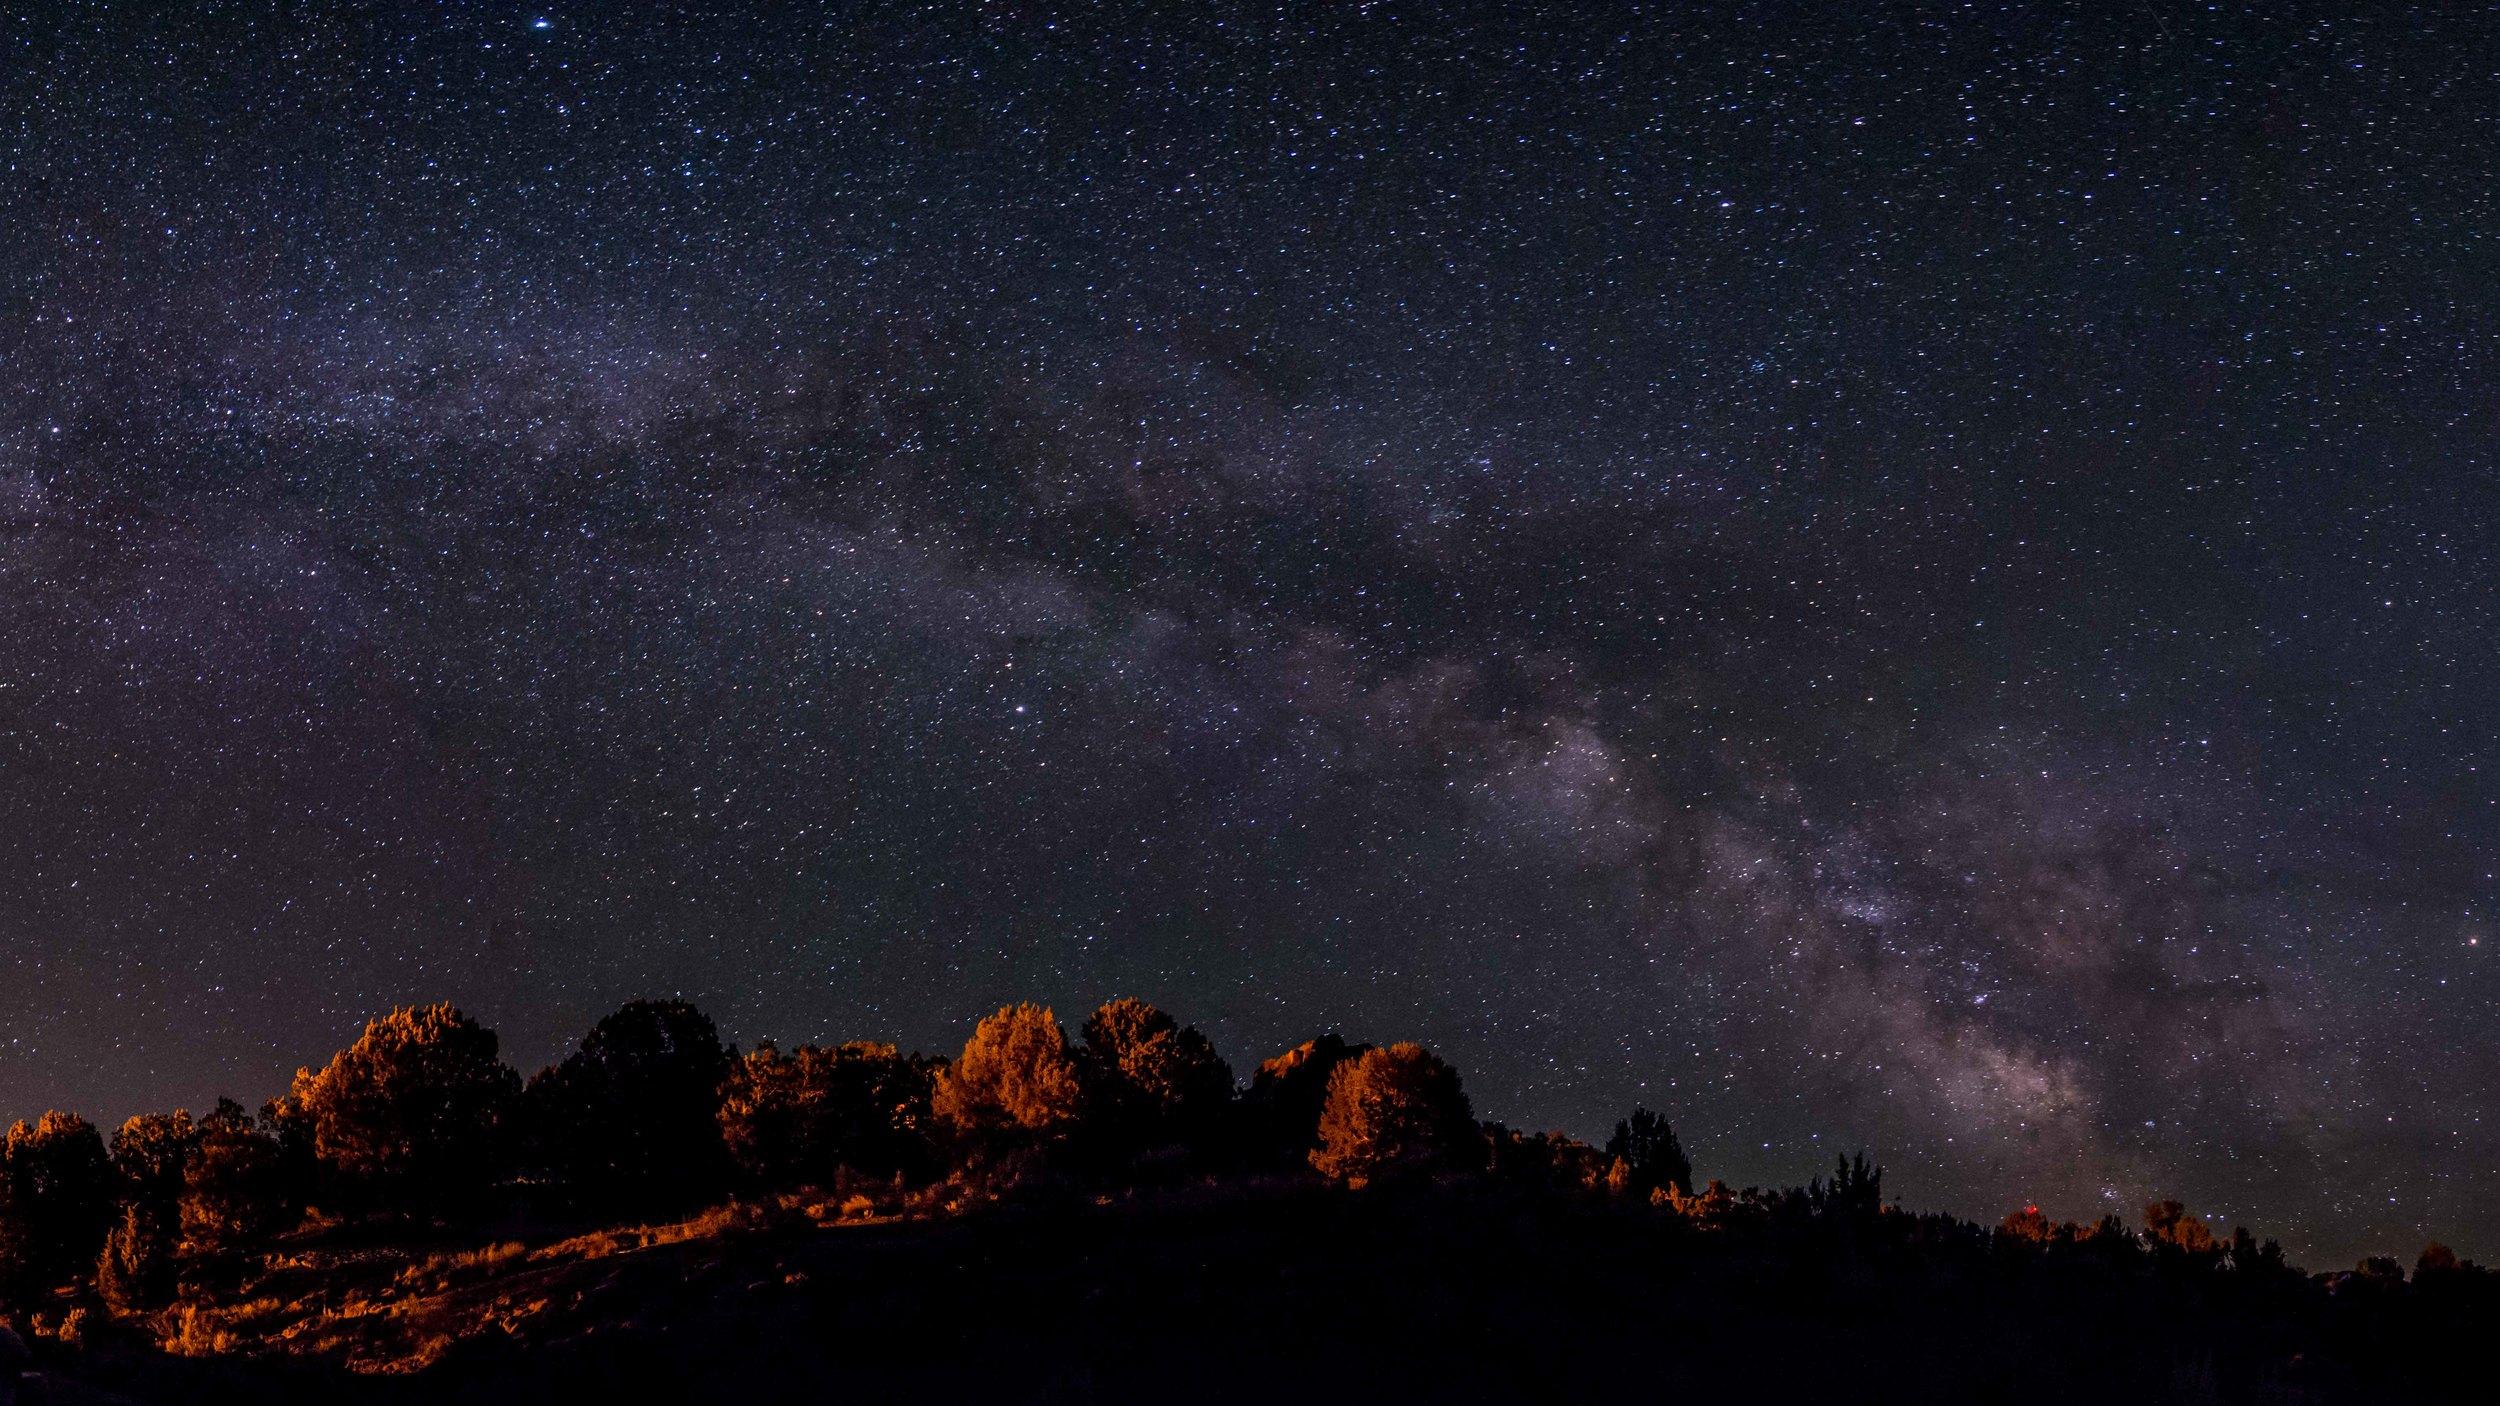 Milky Way over Massacre Rocks